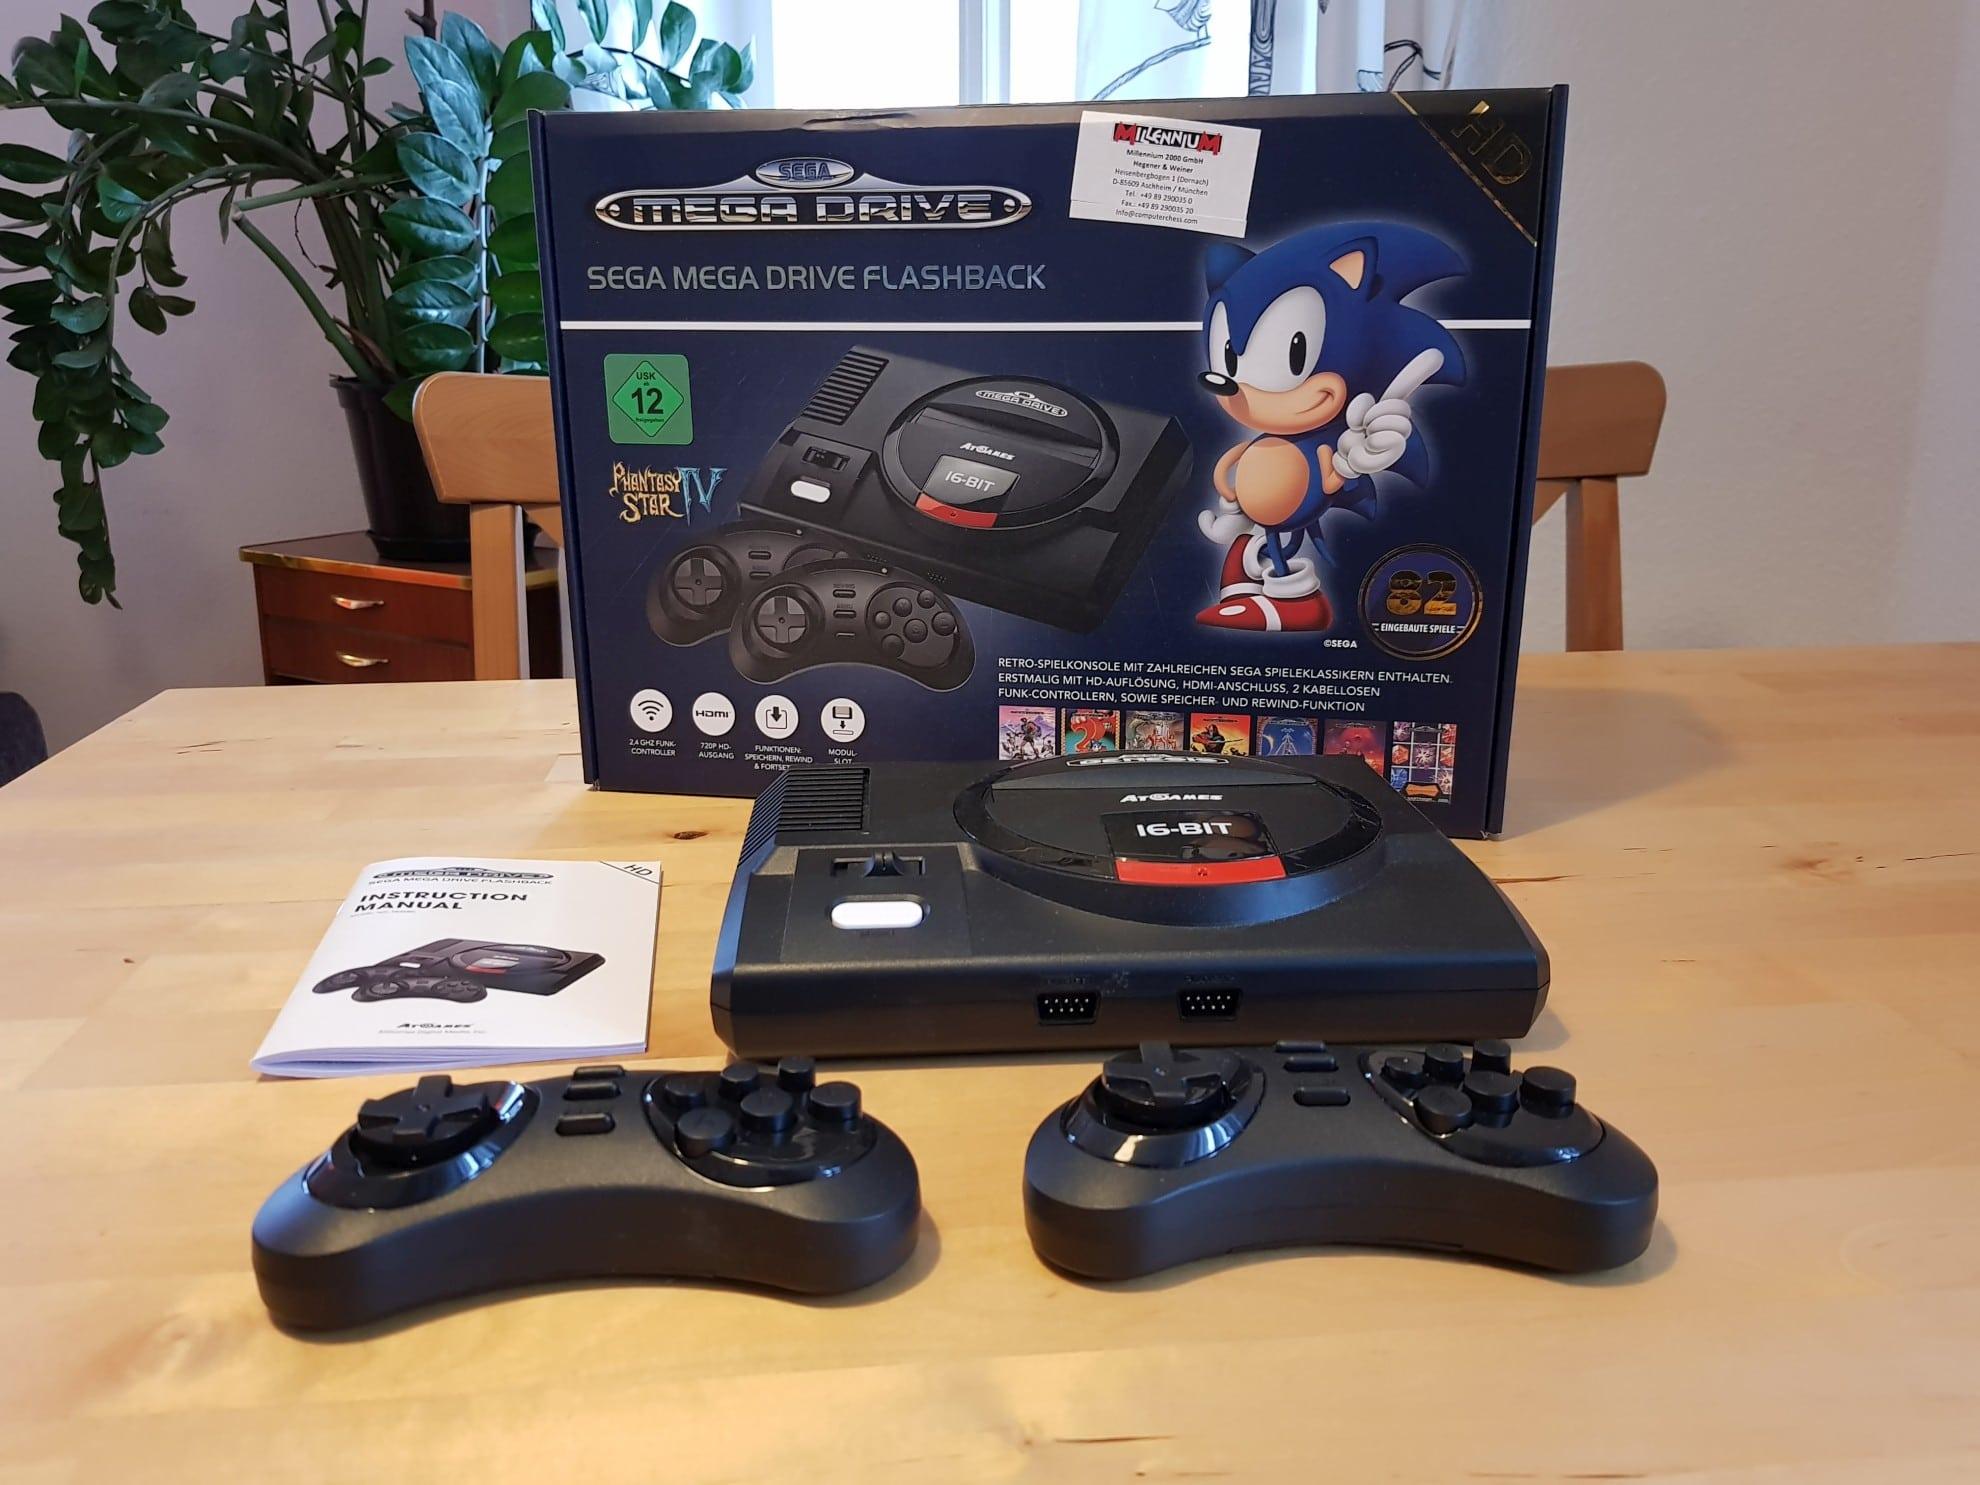 Sega Mega Drive Flashback HD im Test